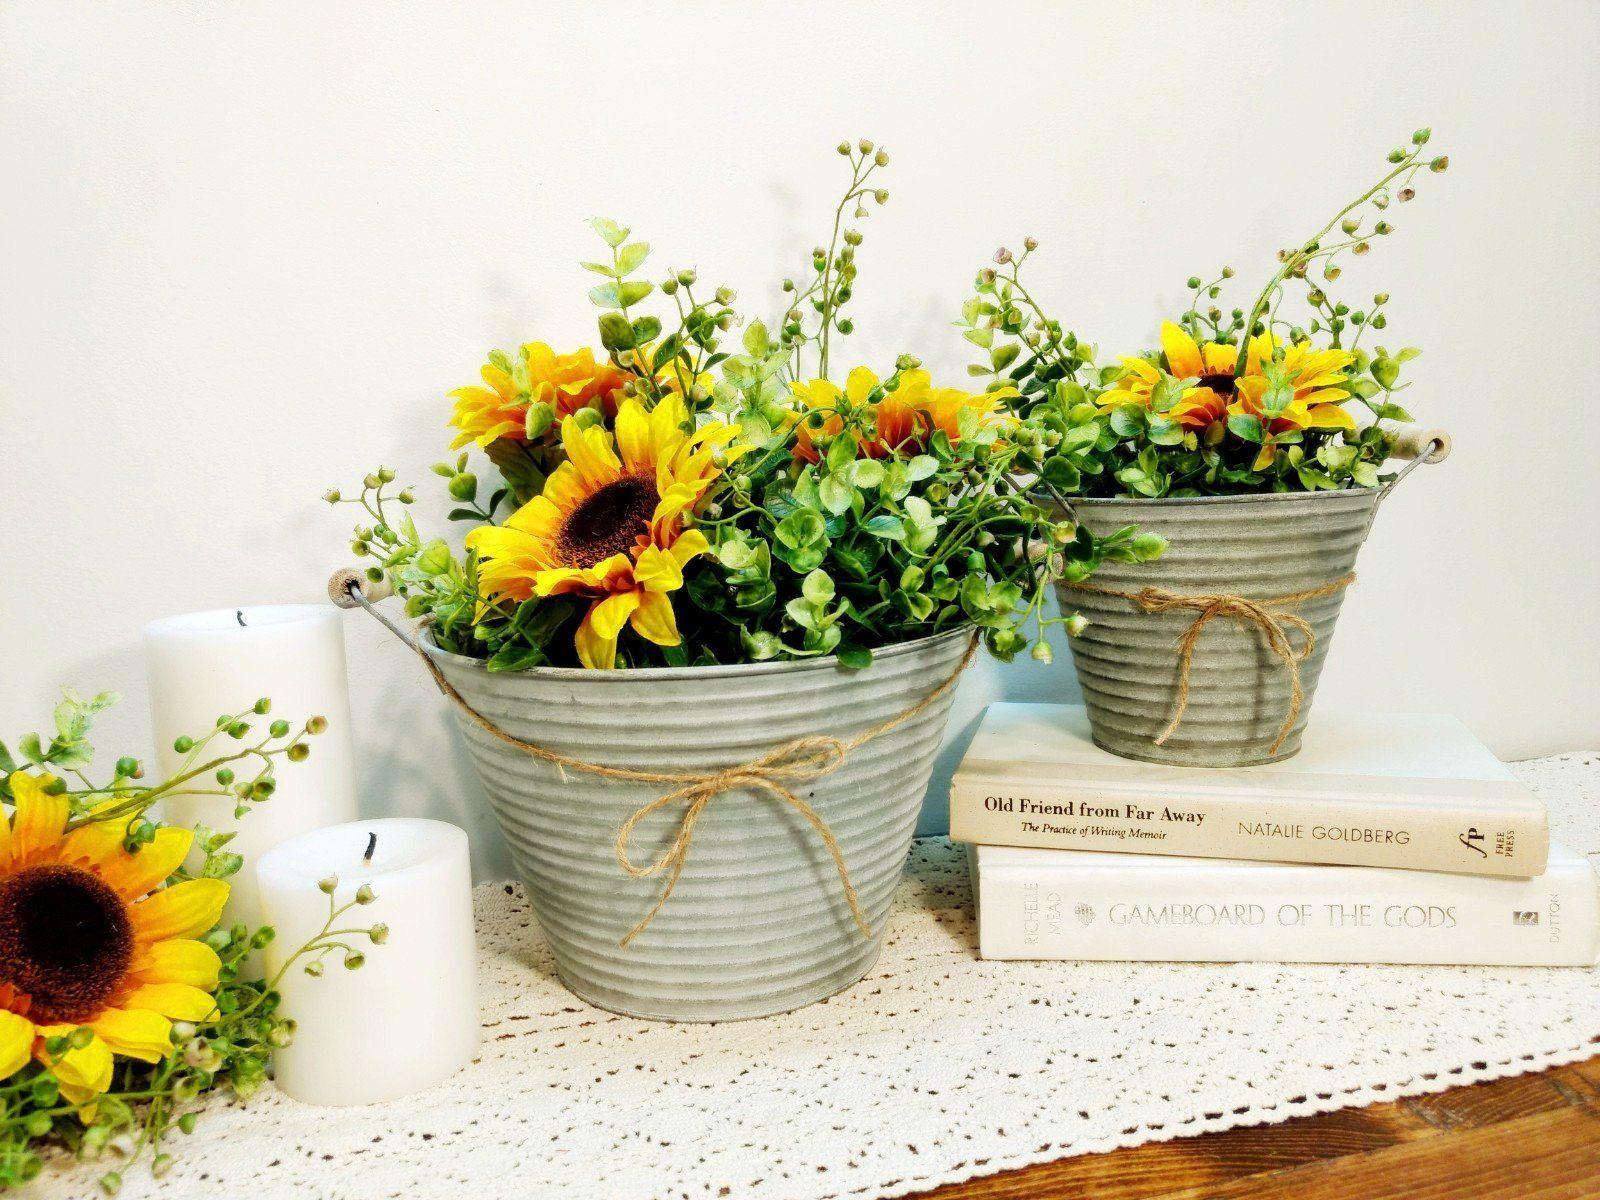 Flower Pot With Sunflowers Planter Pot Rustic Planter With Handles Sunflowers Rustic Flower Pot Home Decor She Flower Pots Rustic Planters Rustic Flowers